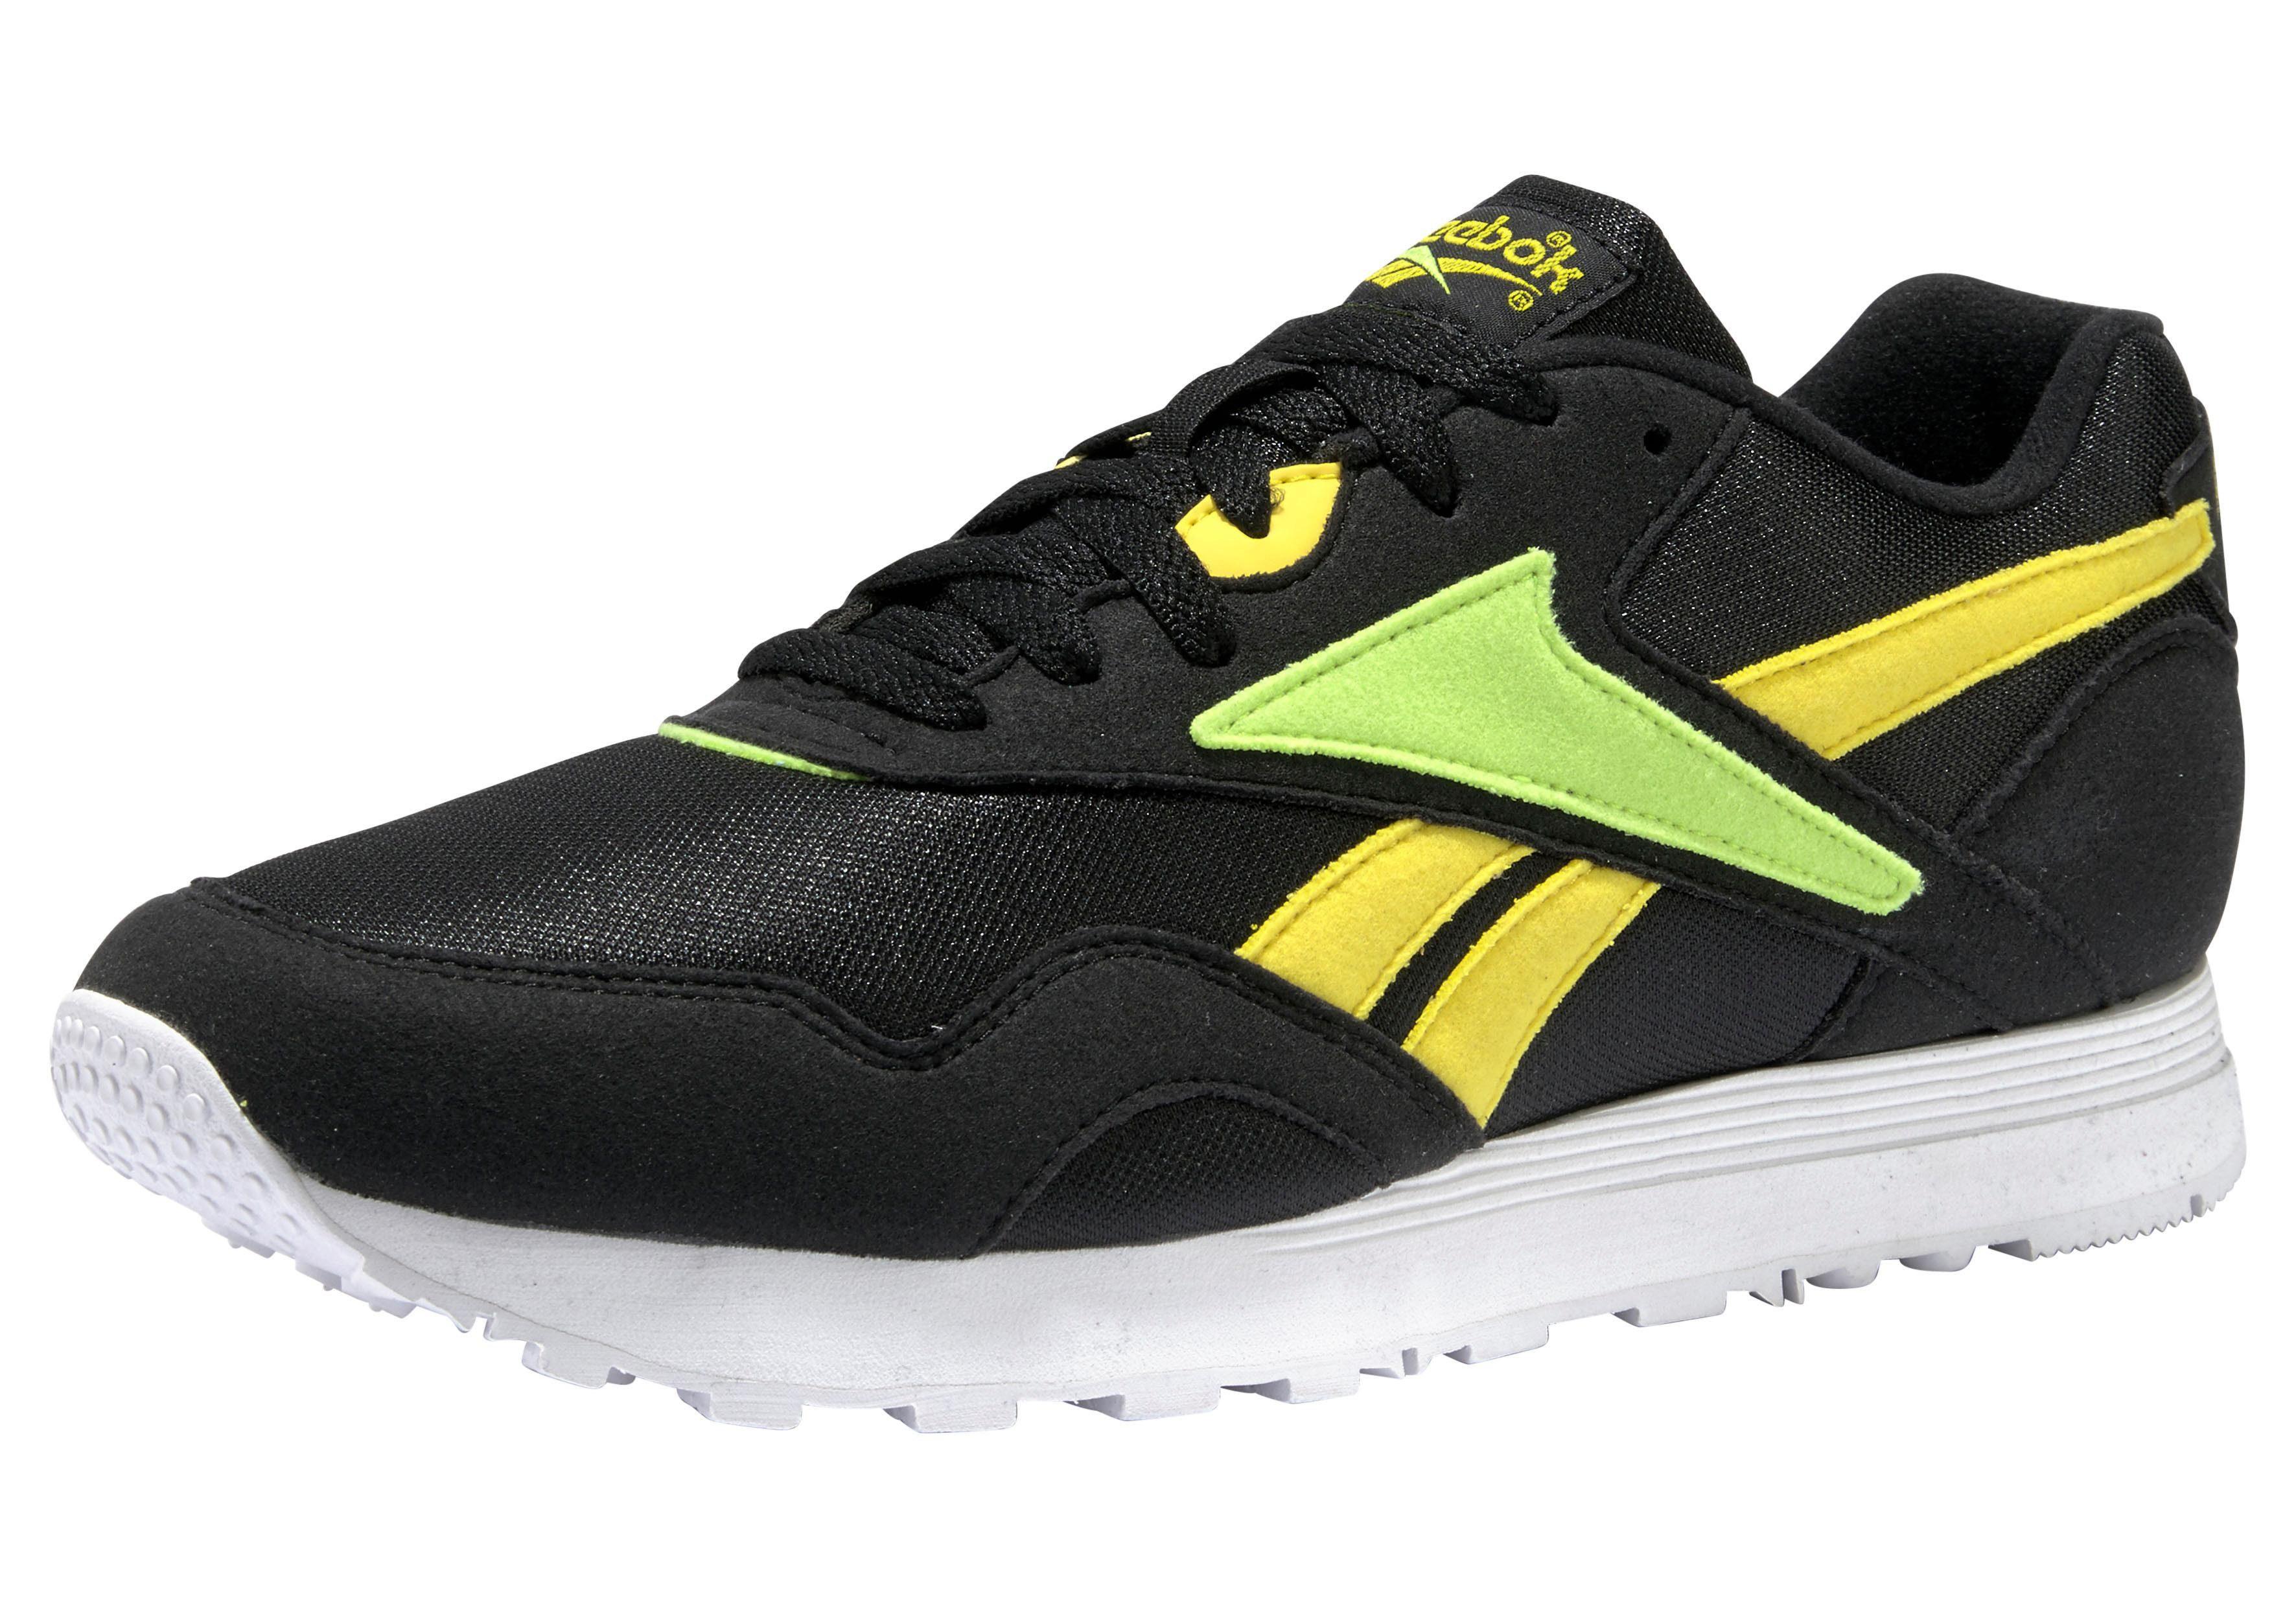 Reebok Classic »Rapide MU« Sneaker, Sportlicher Sneaker von Reebok online kaufen | OTTO